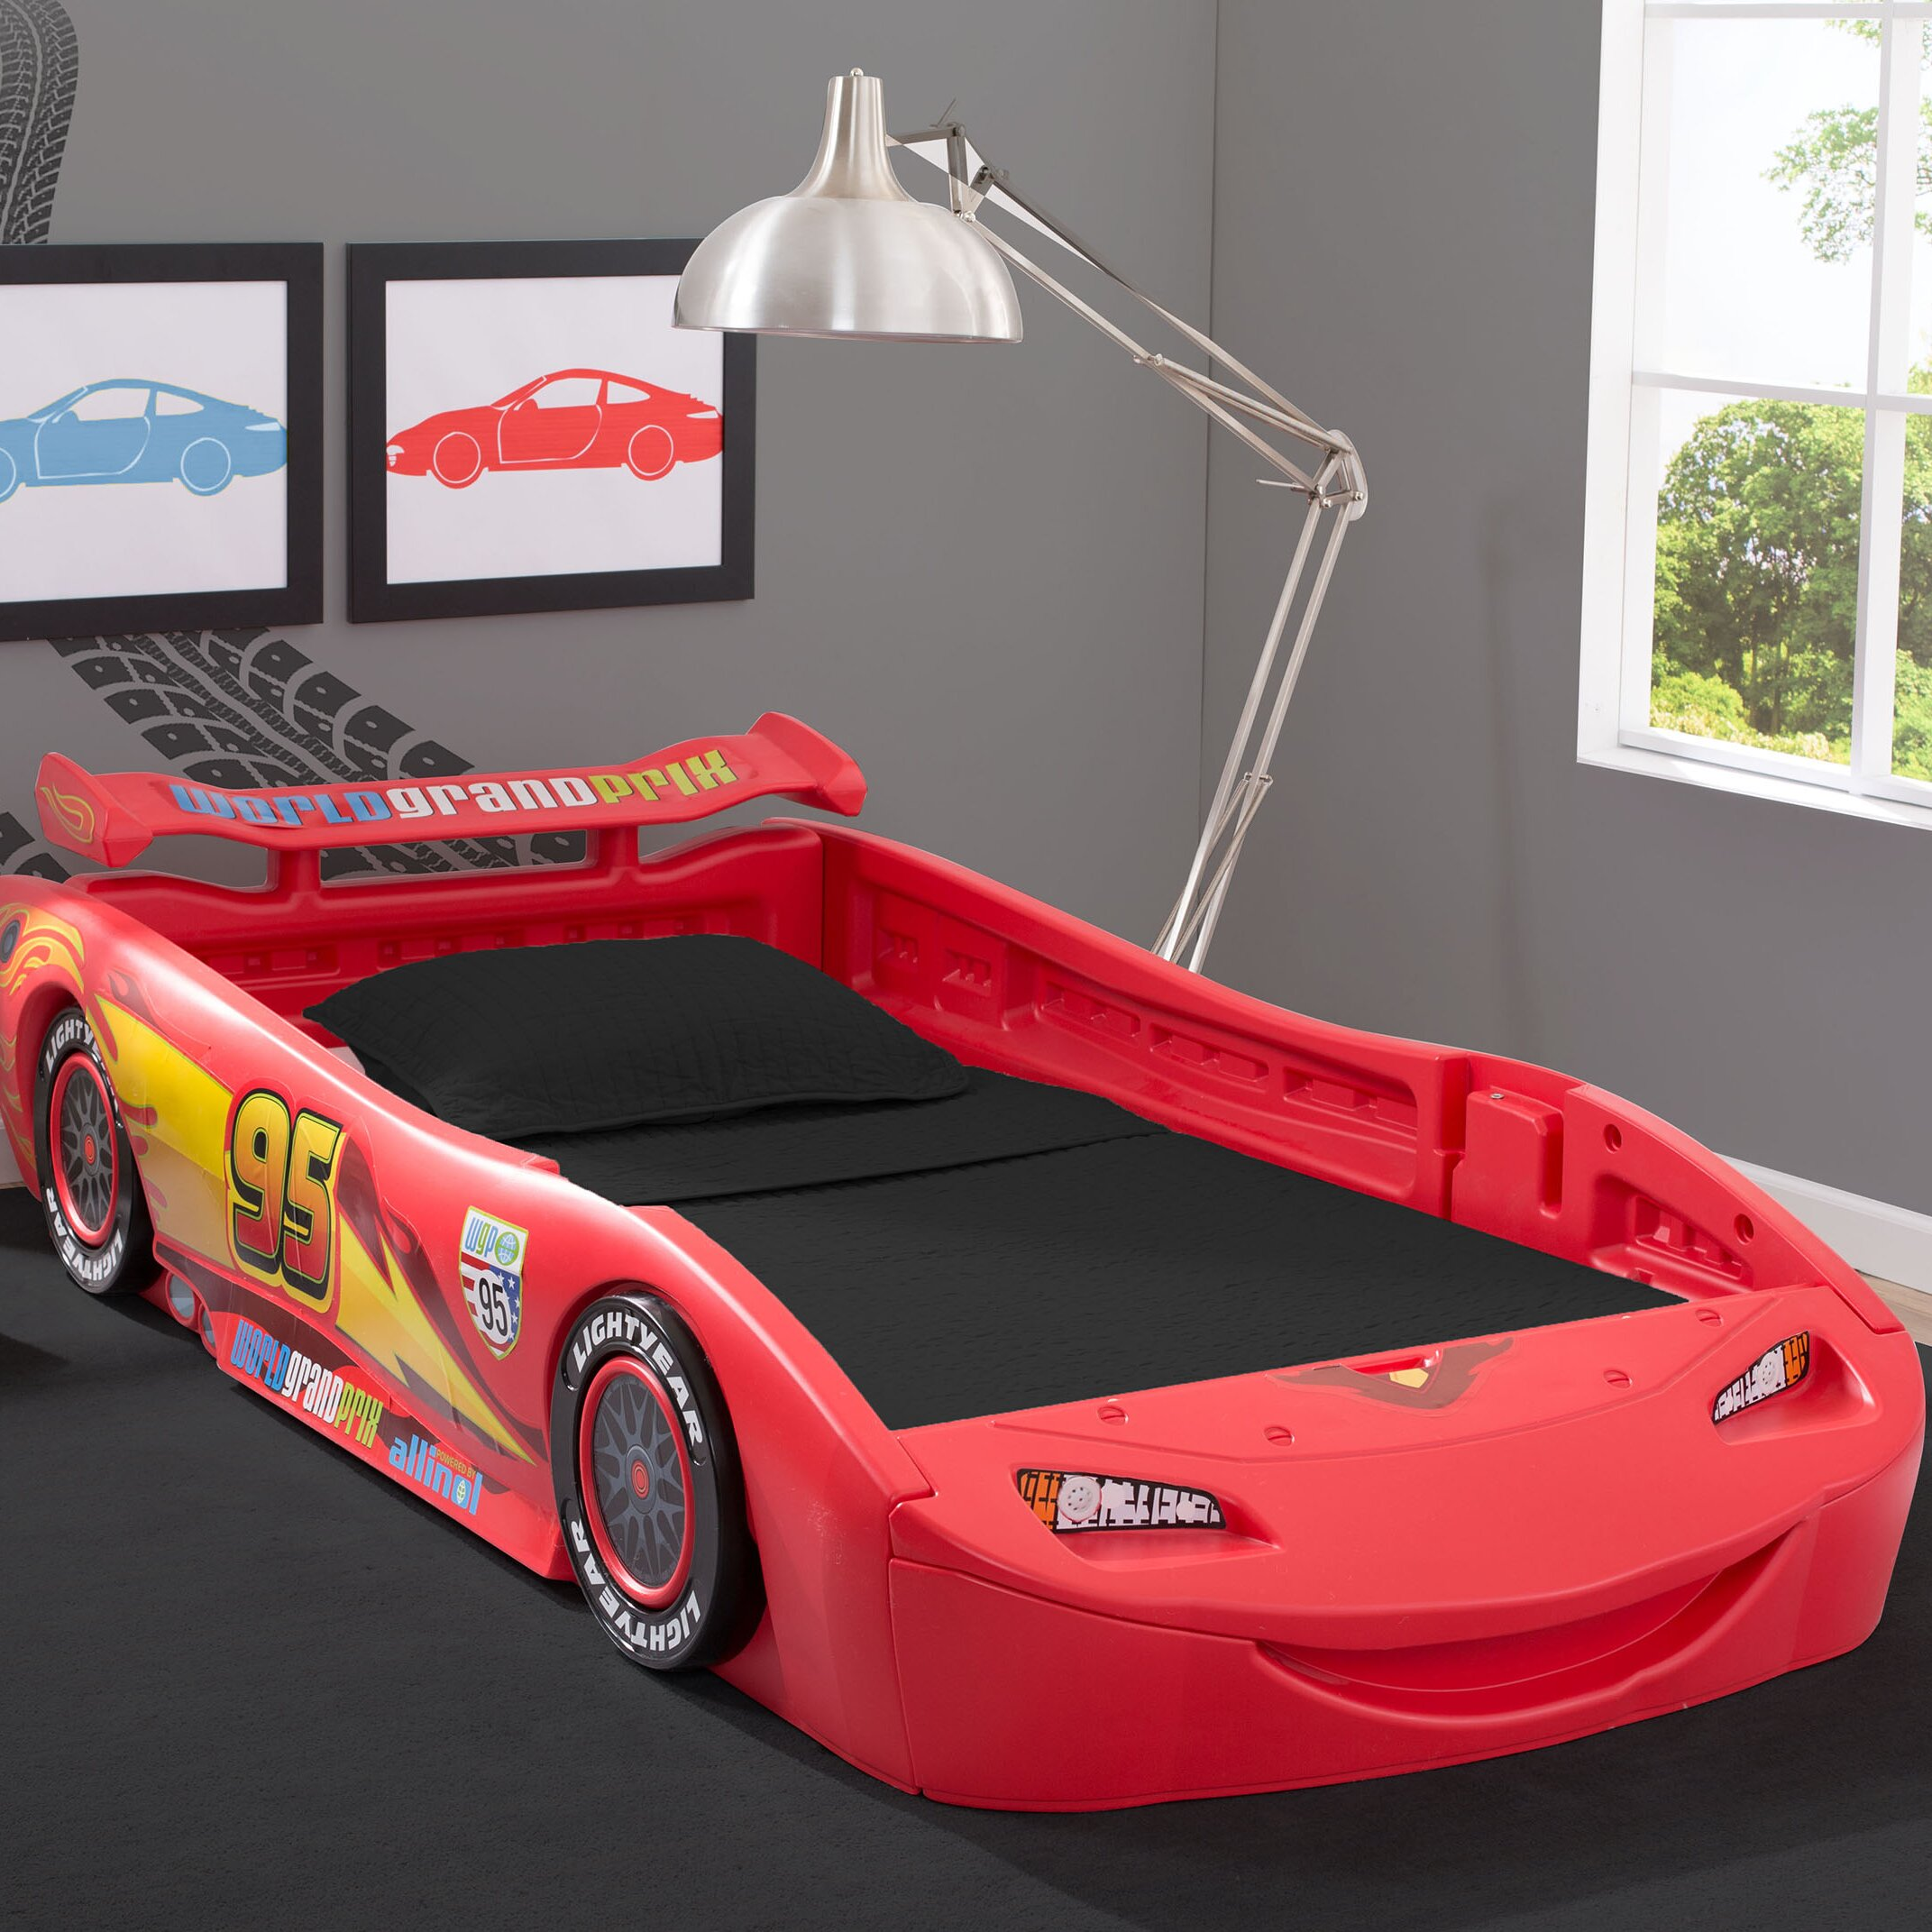 Delta children disney pixar cars twin bed with lights for Disney pixar cars bedroom ideas